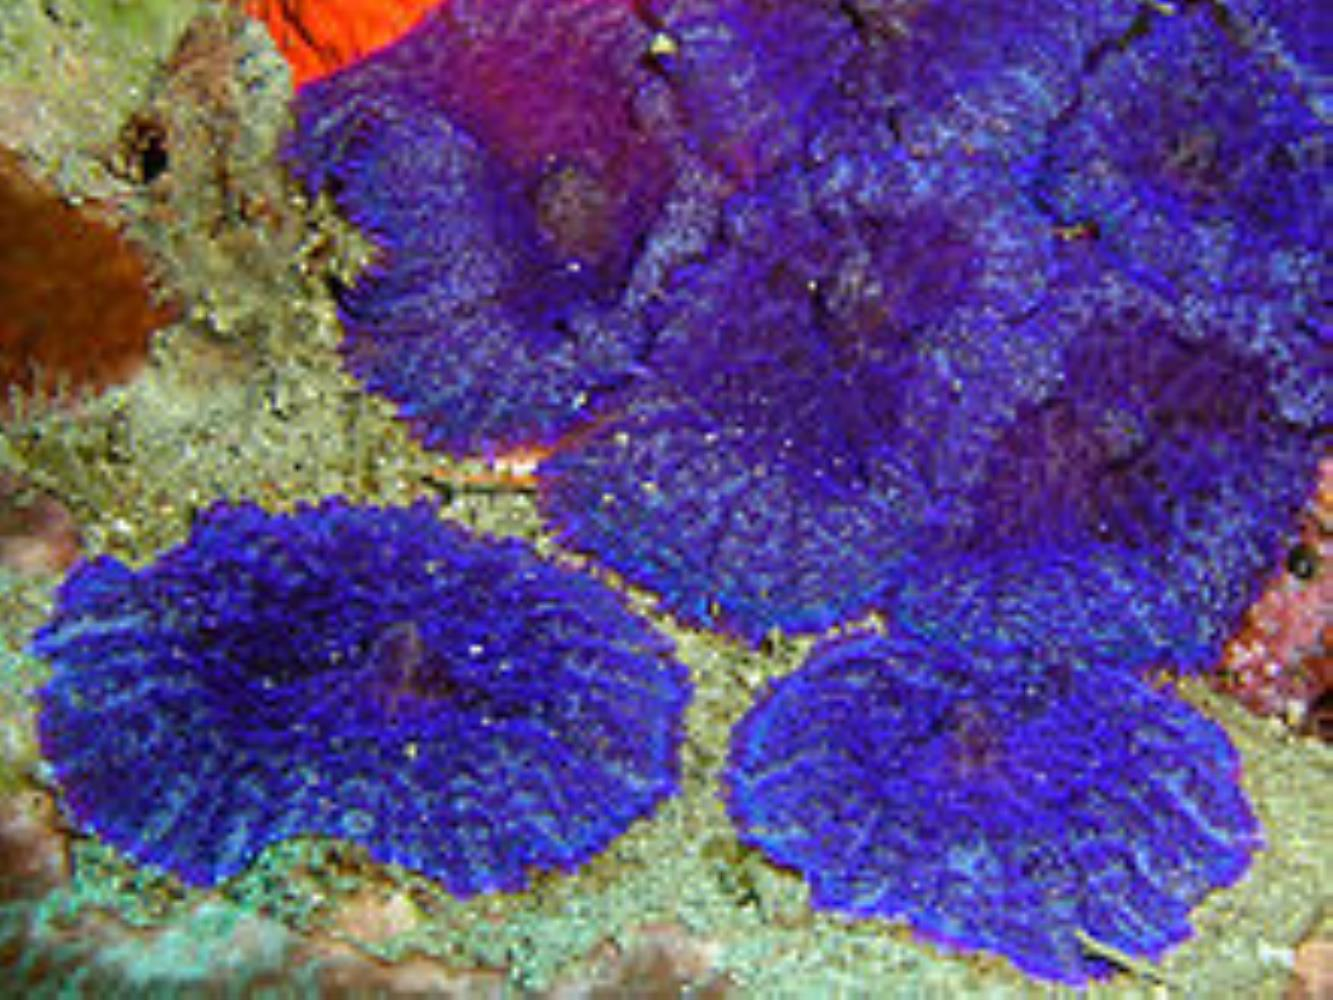 Elephant-ear corals